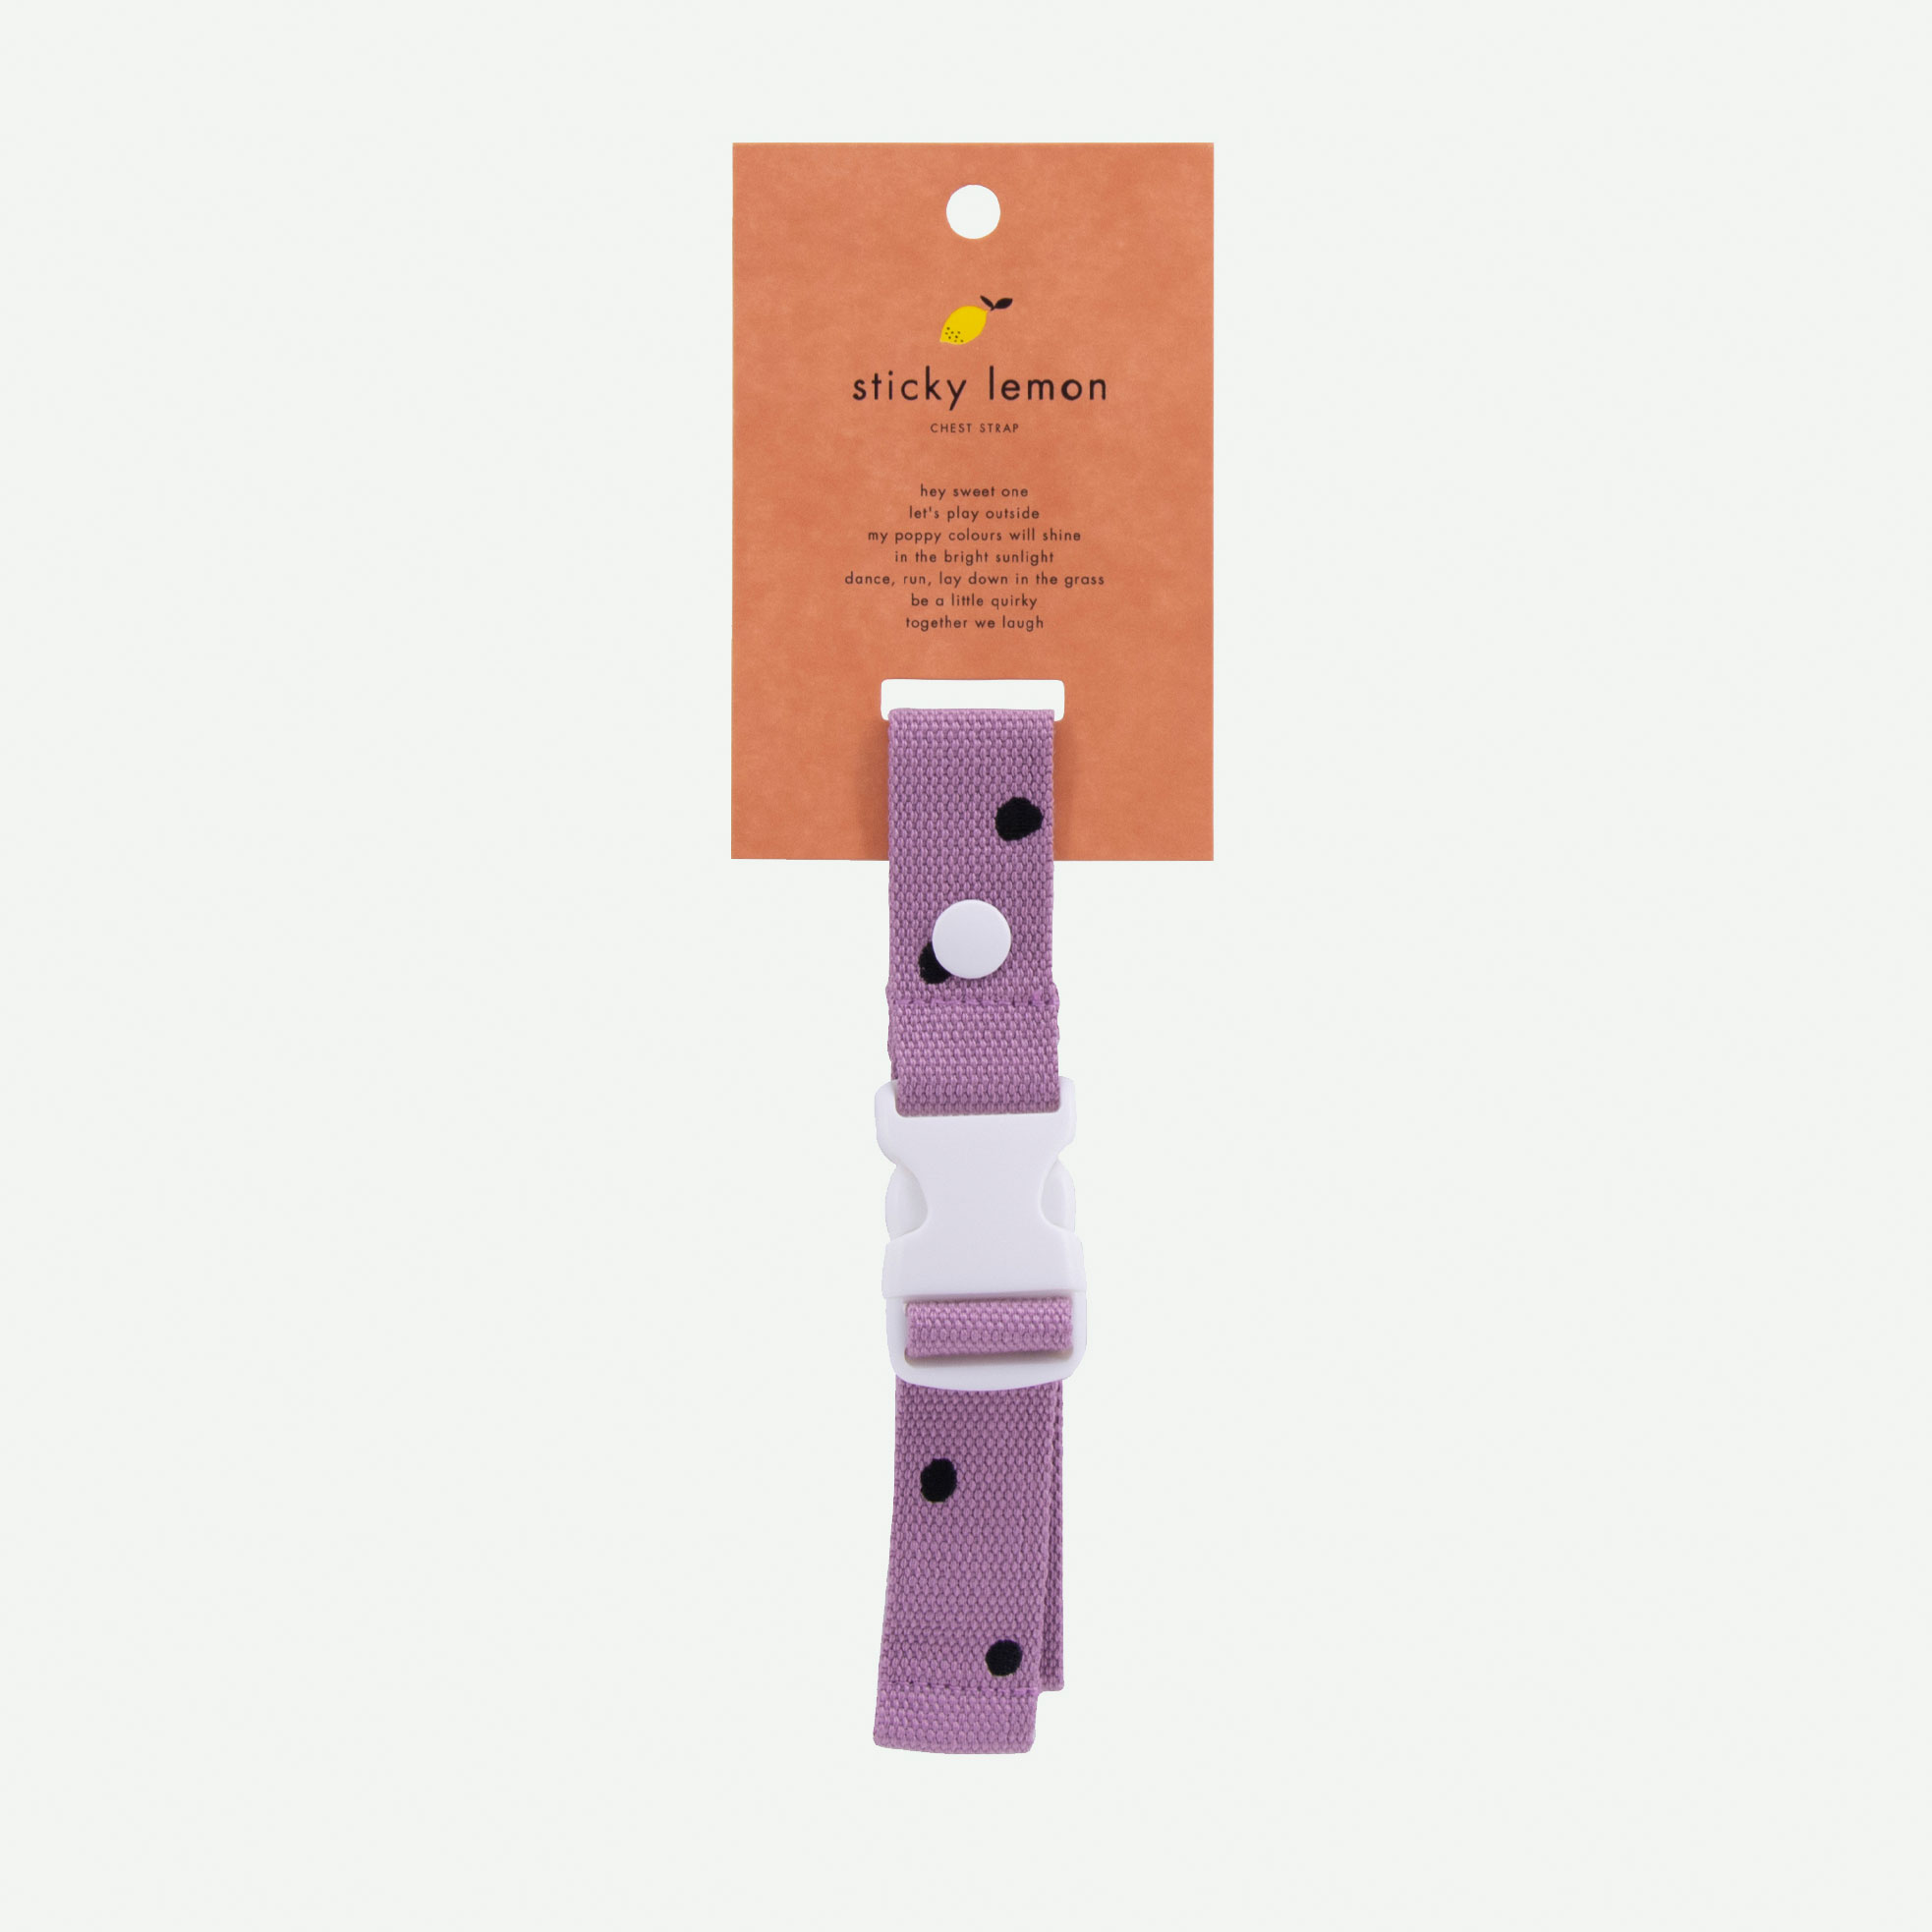 Sticky Lemon - Brustgurt Rucksack Freckles pirate purple